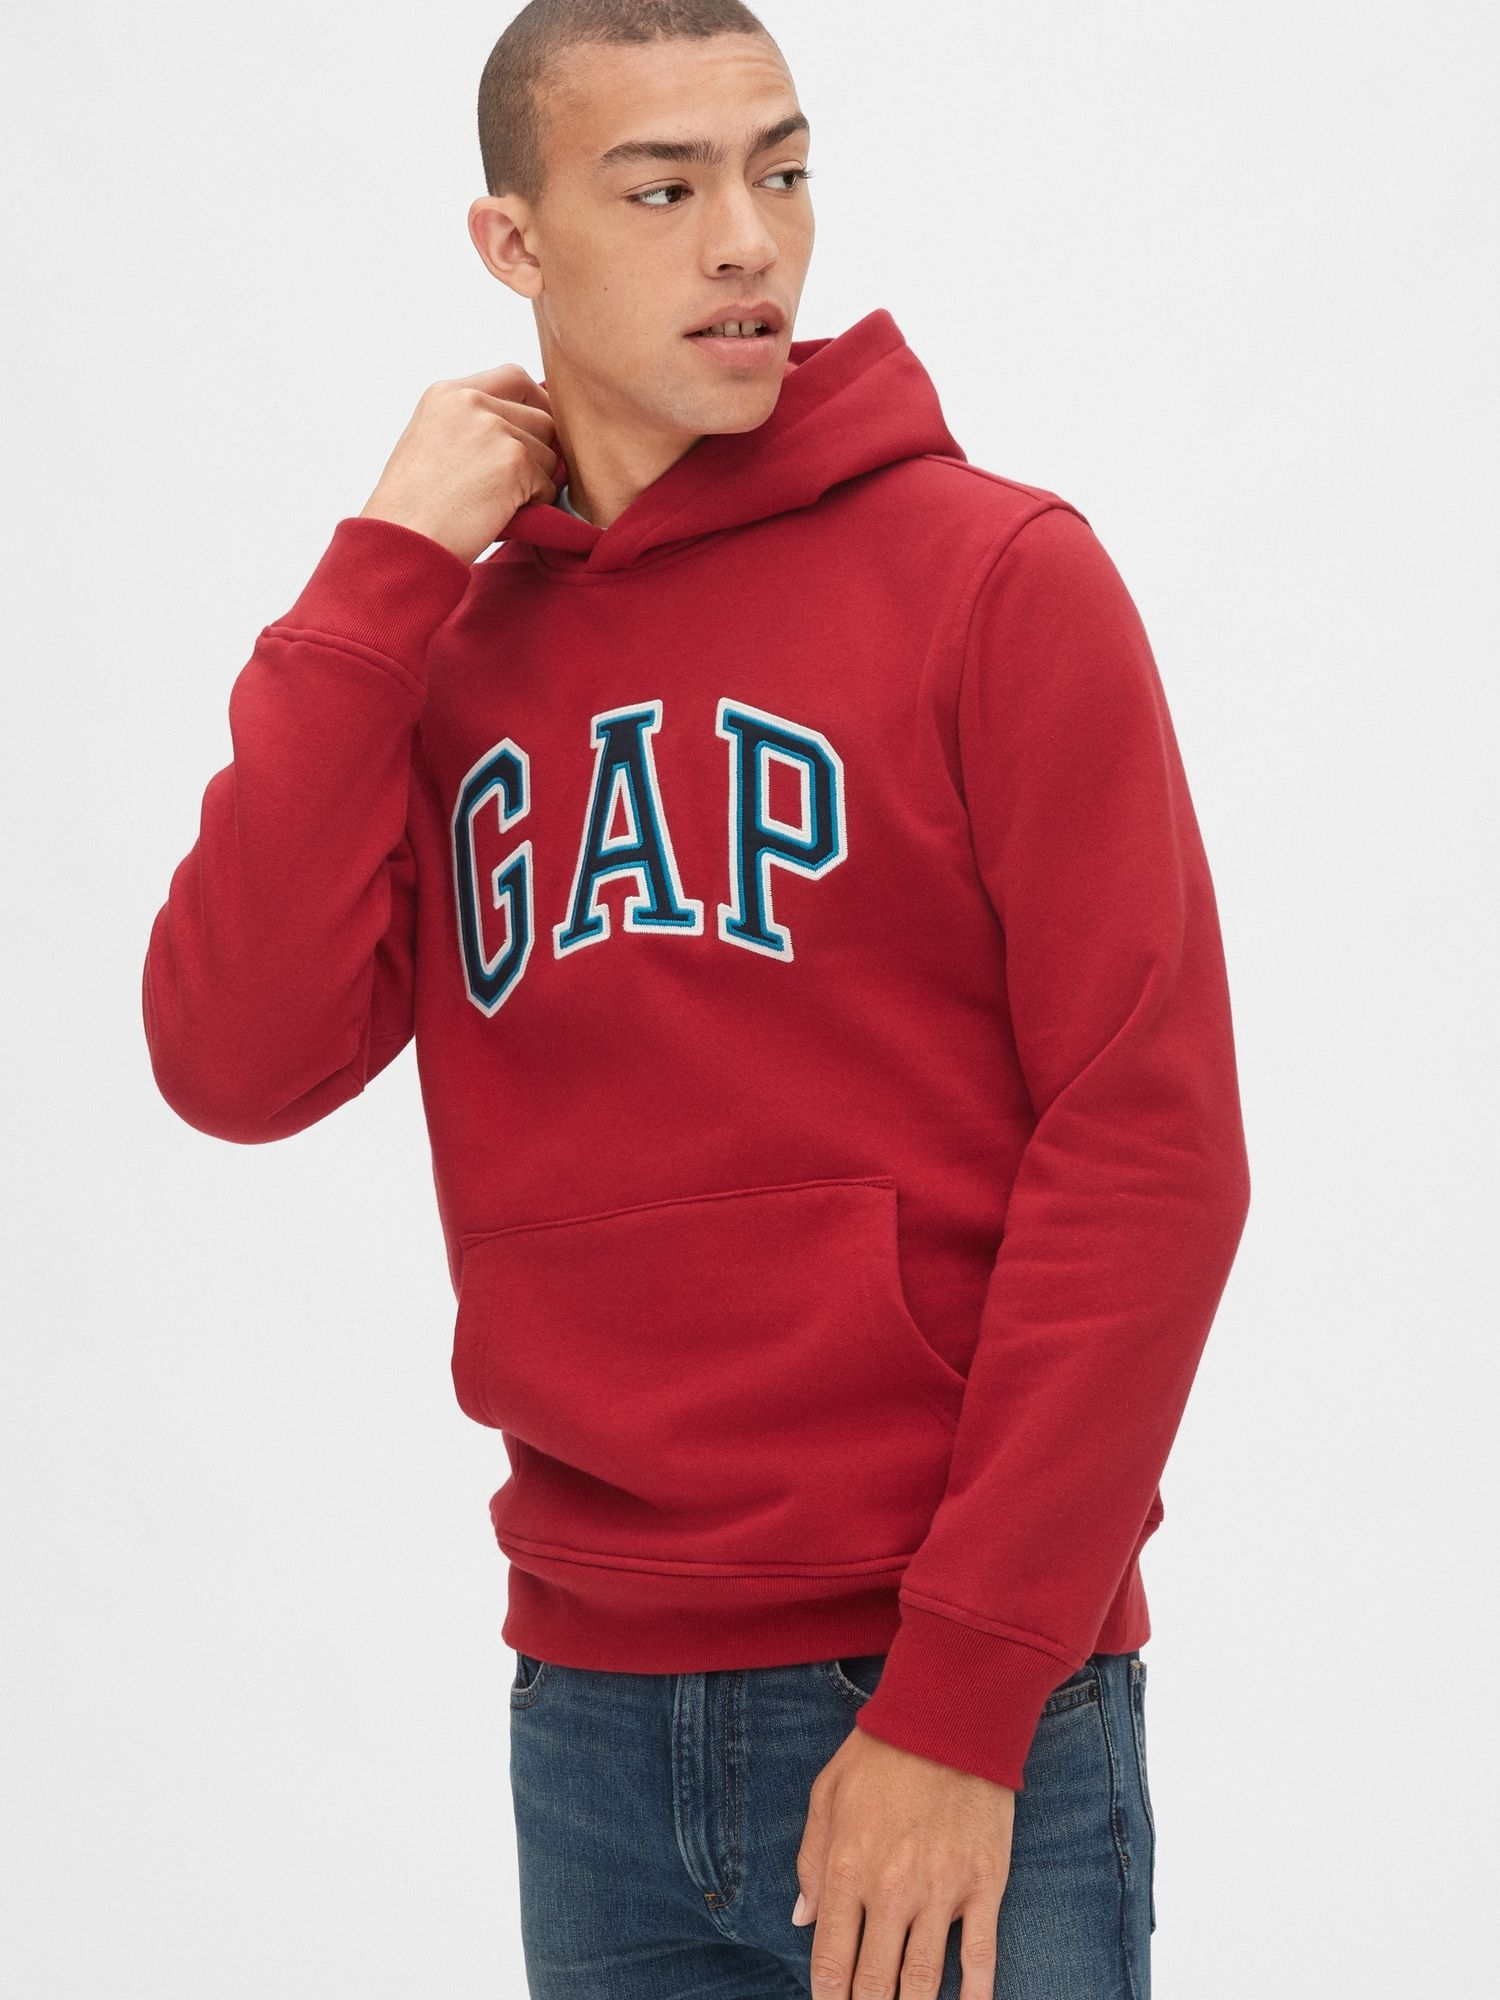 Pin By Iambains On Shoooooopppppppiiiii In 2020 Gap Logo Gap Sweatshirt Hoodie Gap